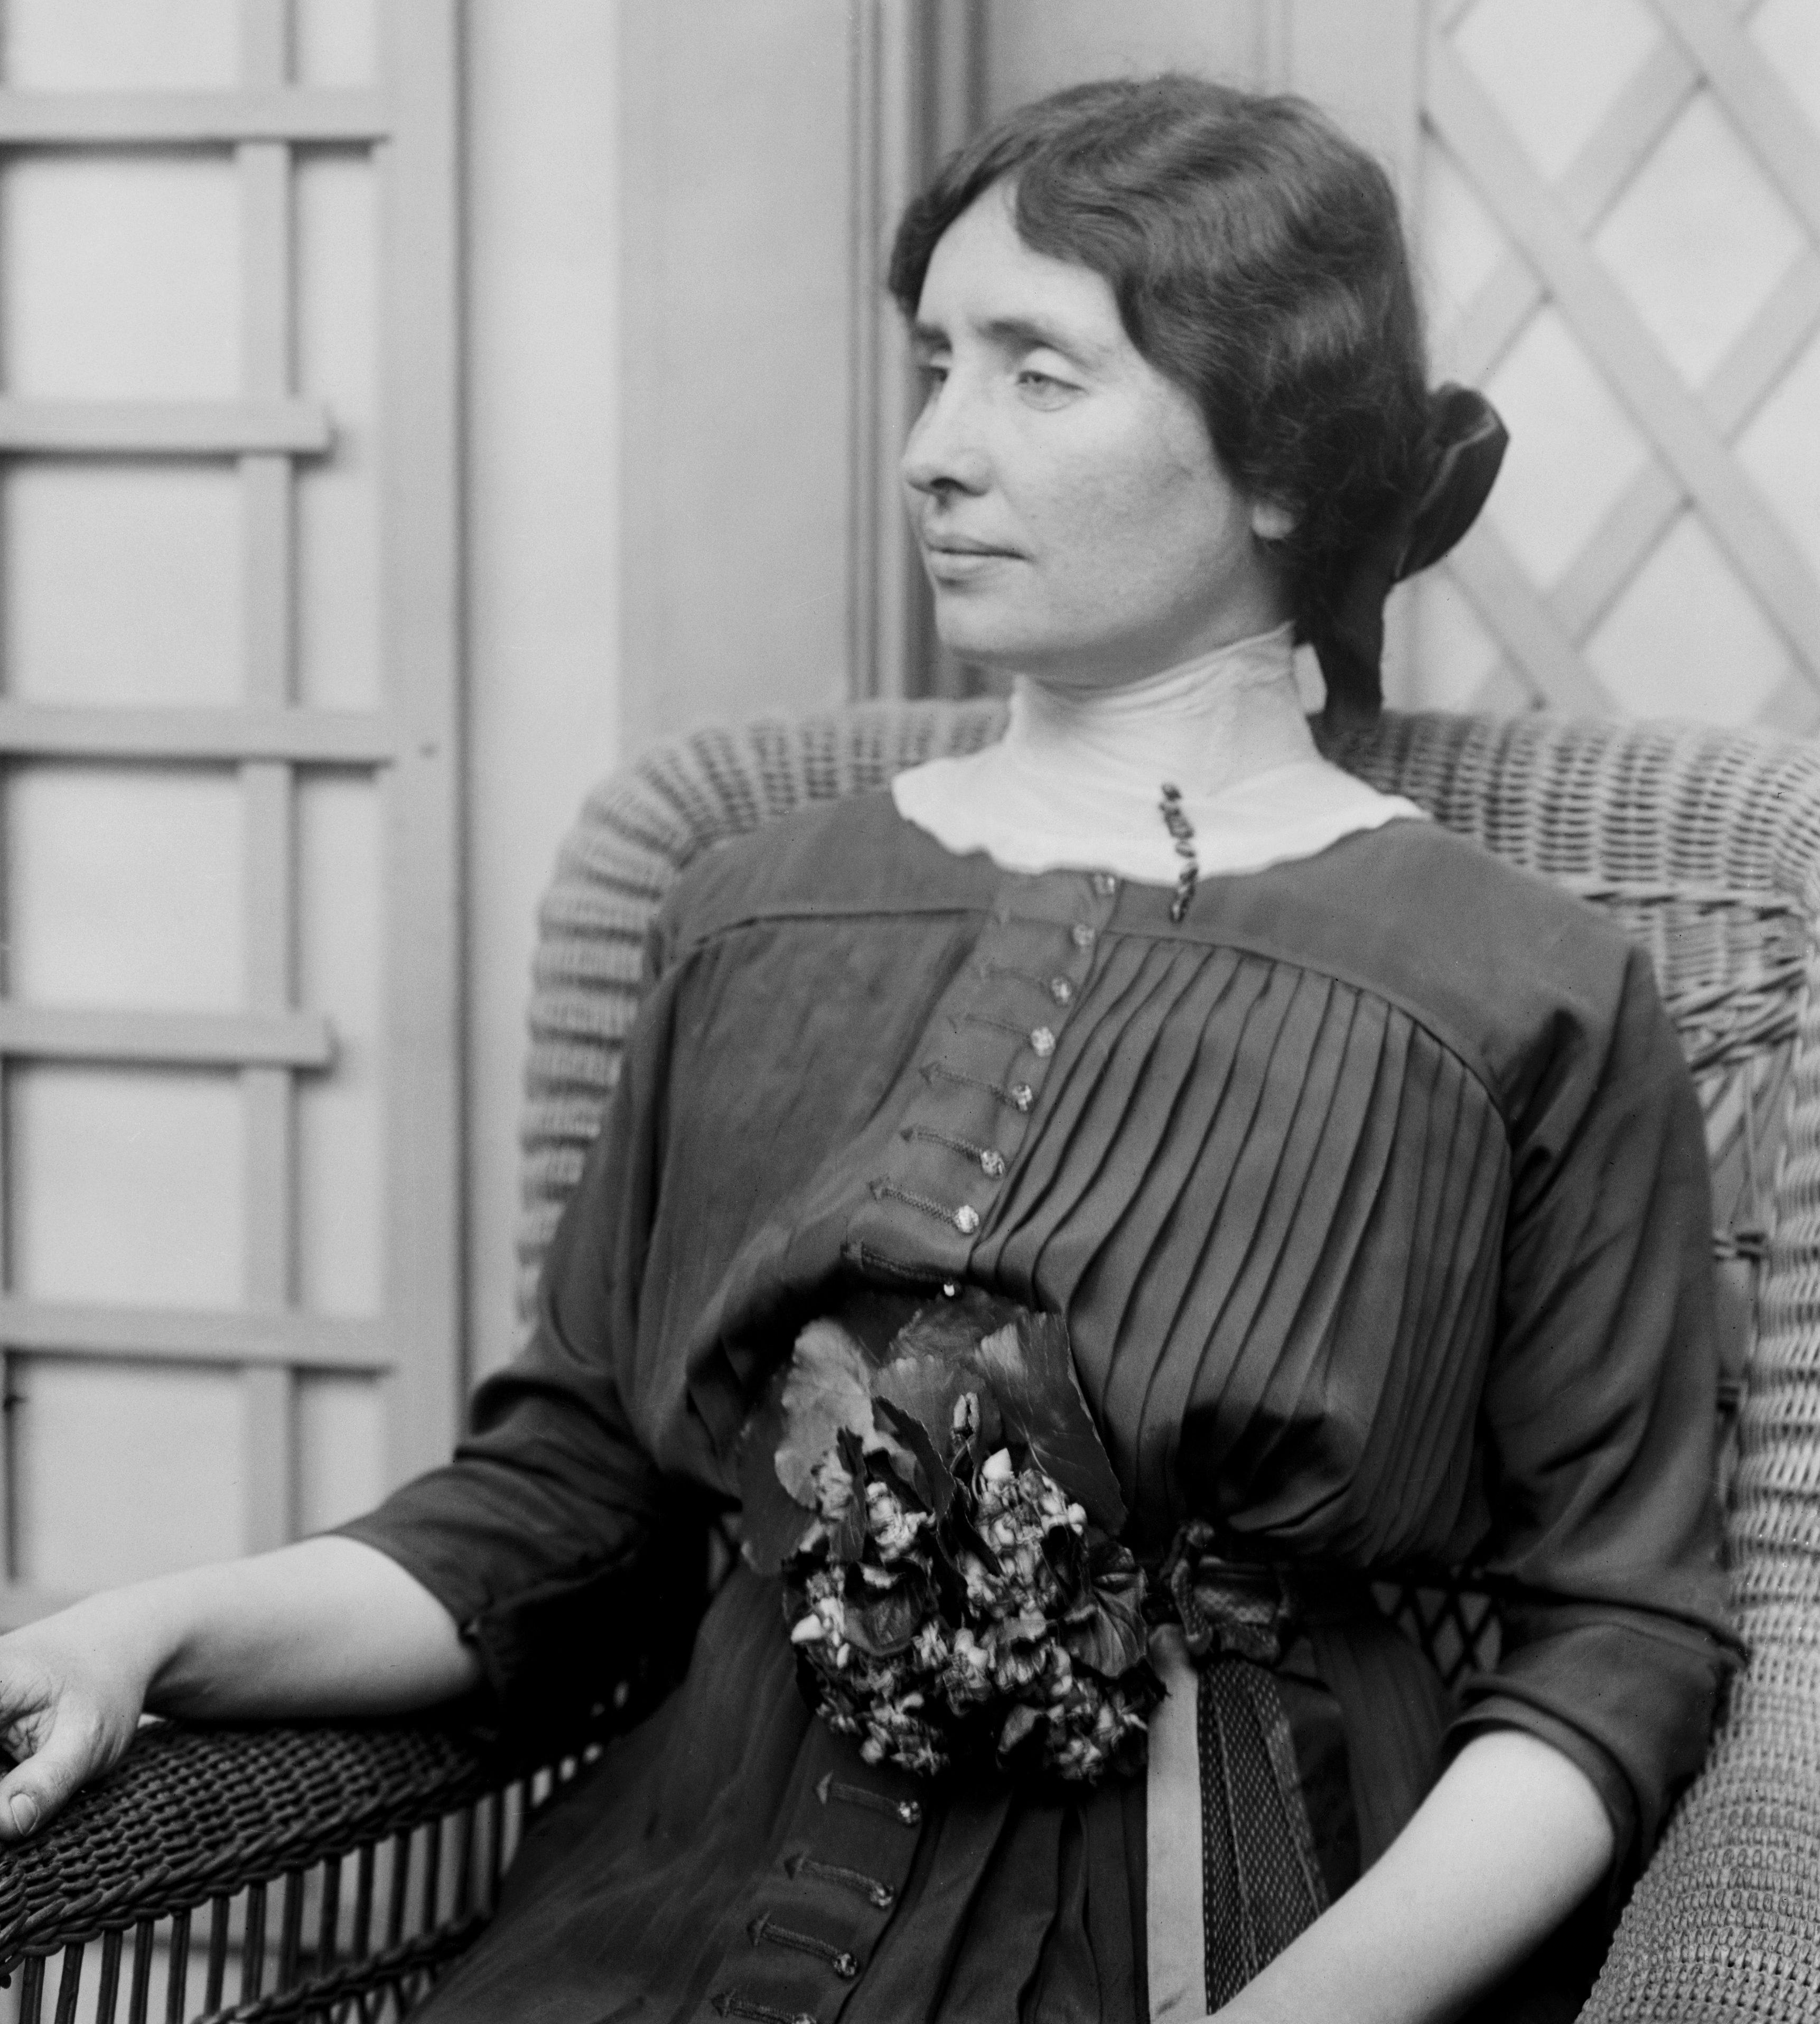 Mandatory Credit: Photo by Glasshouse Images/Shutterstock (5794154a) Helen Keller, Portrait, Bain News Service, circa 1913 VARIOUS